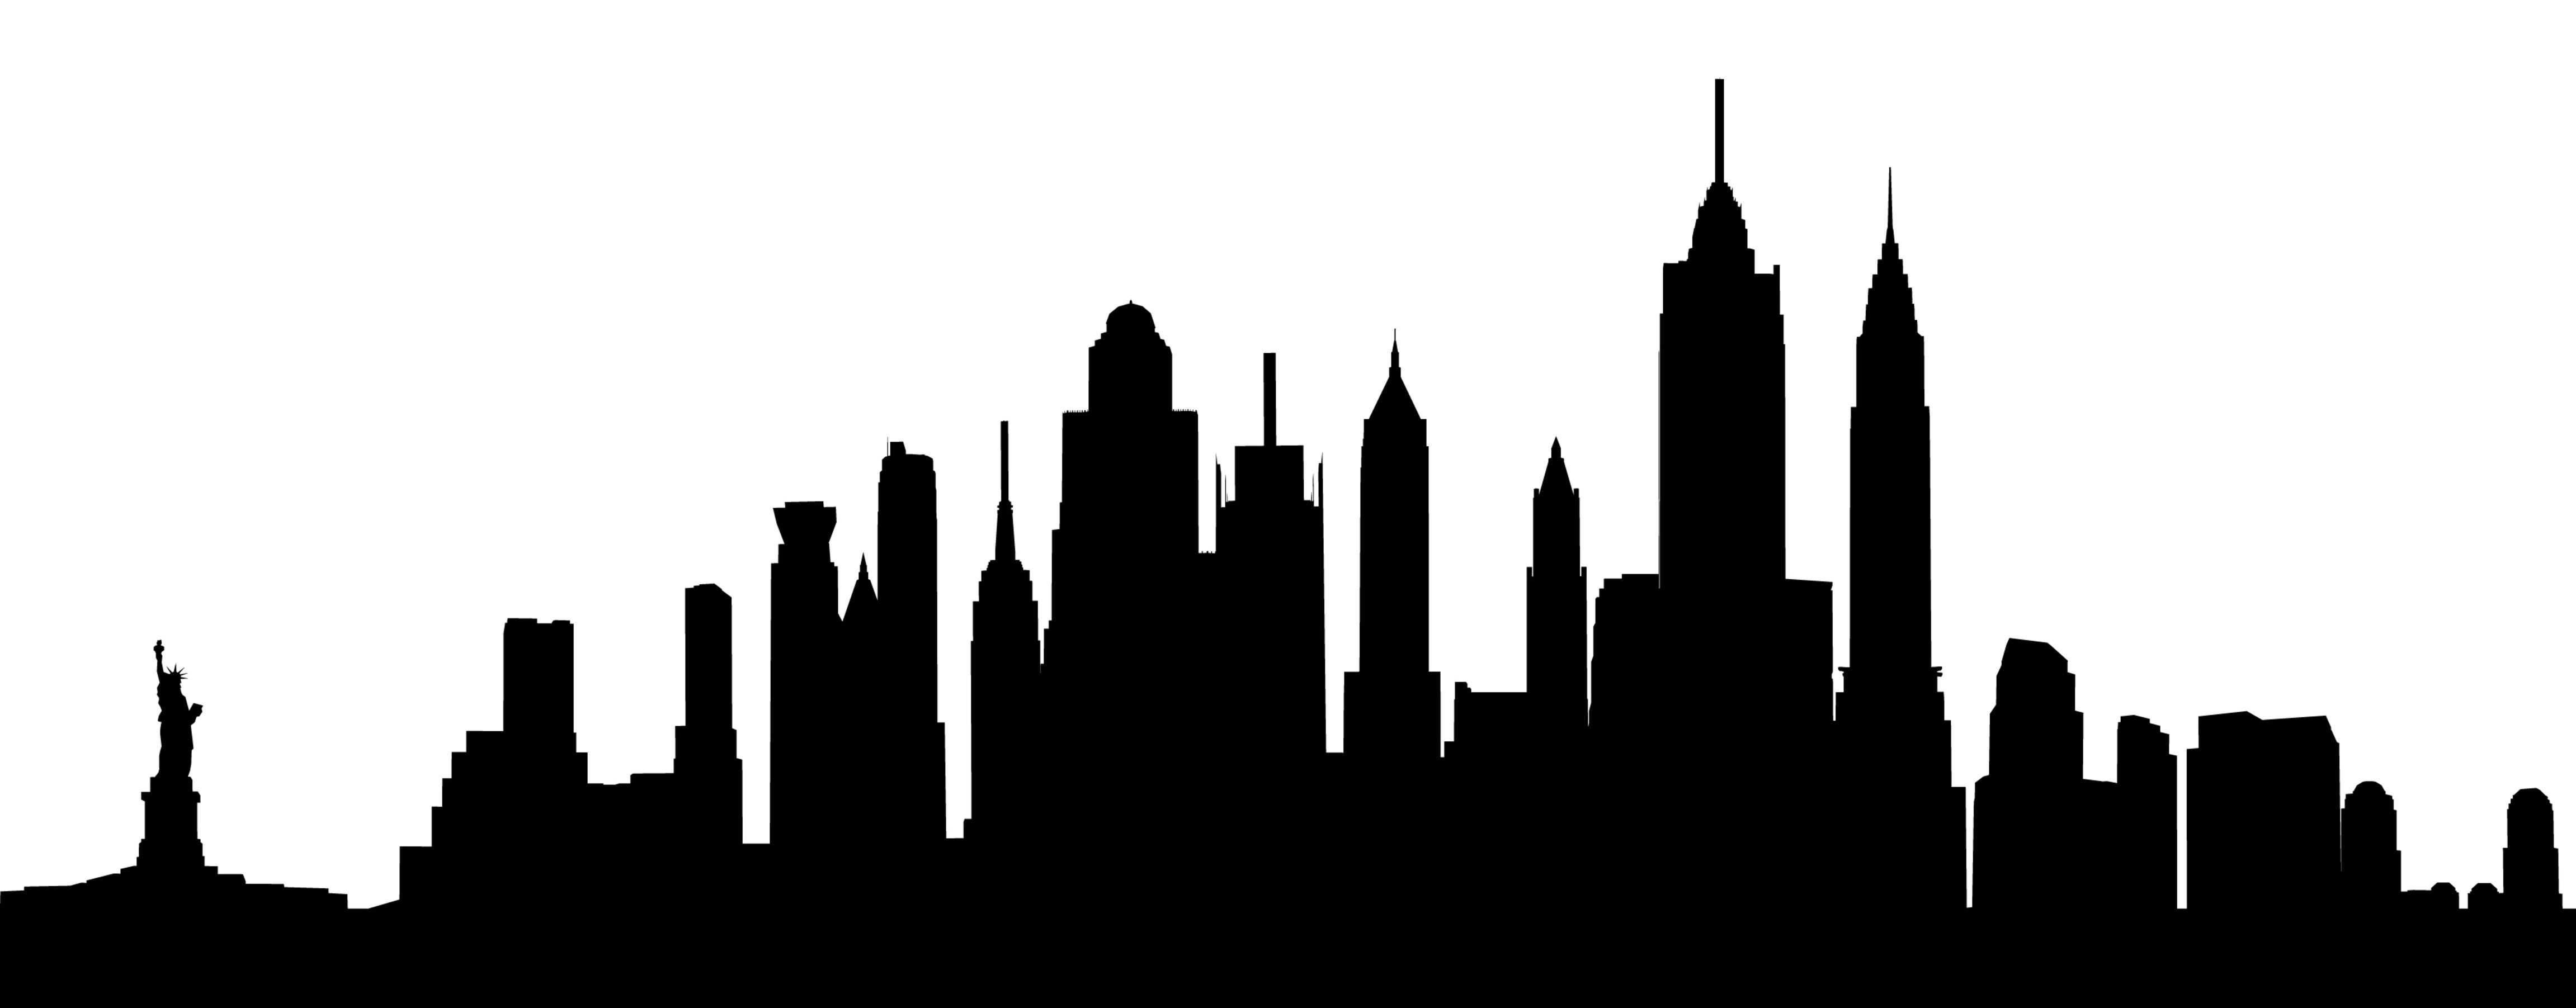 New York City Skyline New York Skyline Silhouette Skyline City Skyline